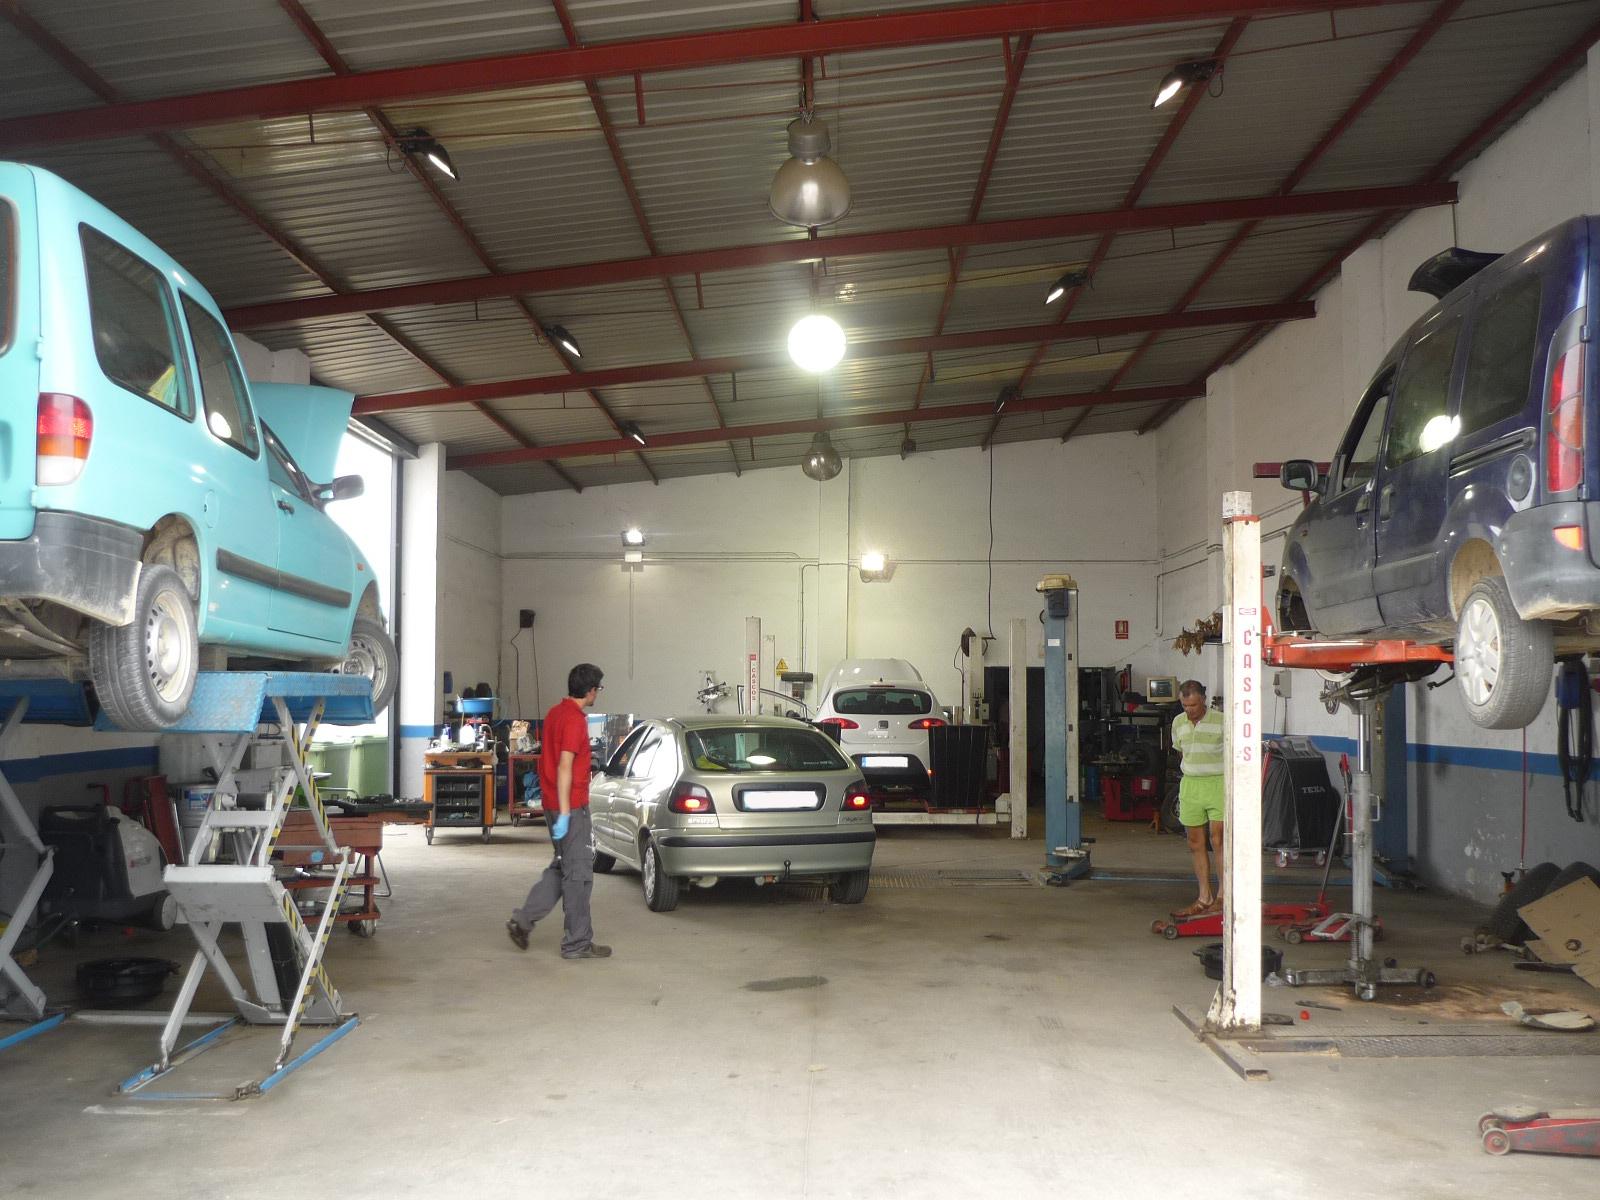 talleres, mecánicos, sánchez